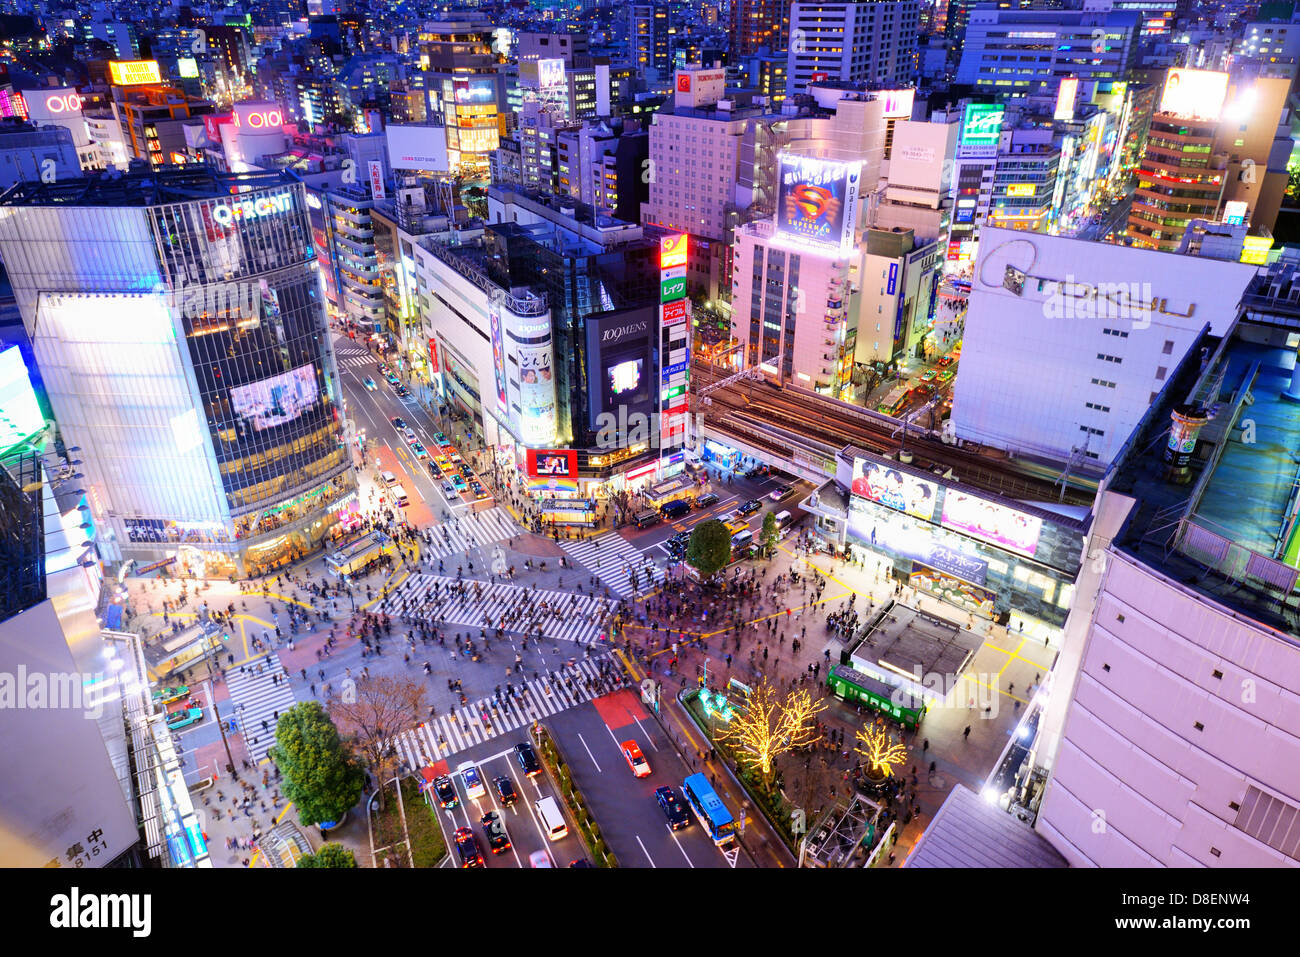 Paesaggio di Shibuya, Tokyo, Giappone. Immagini Stock